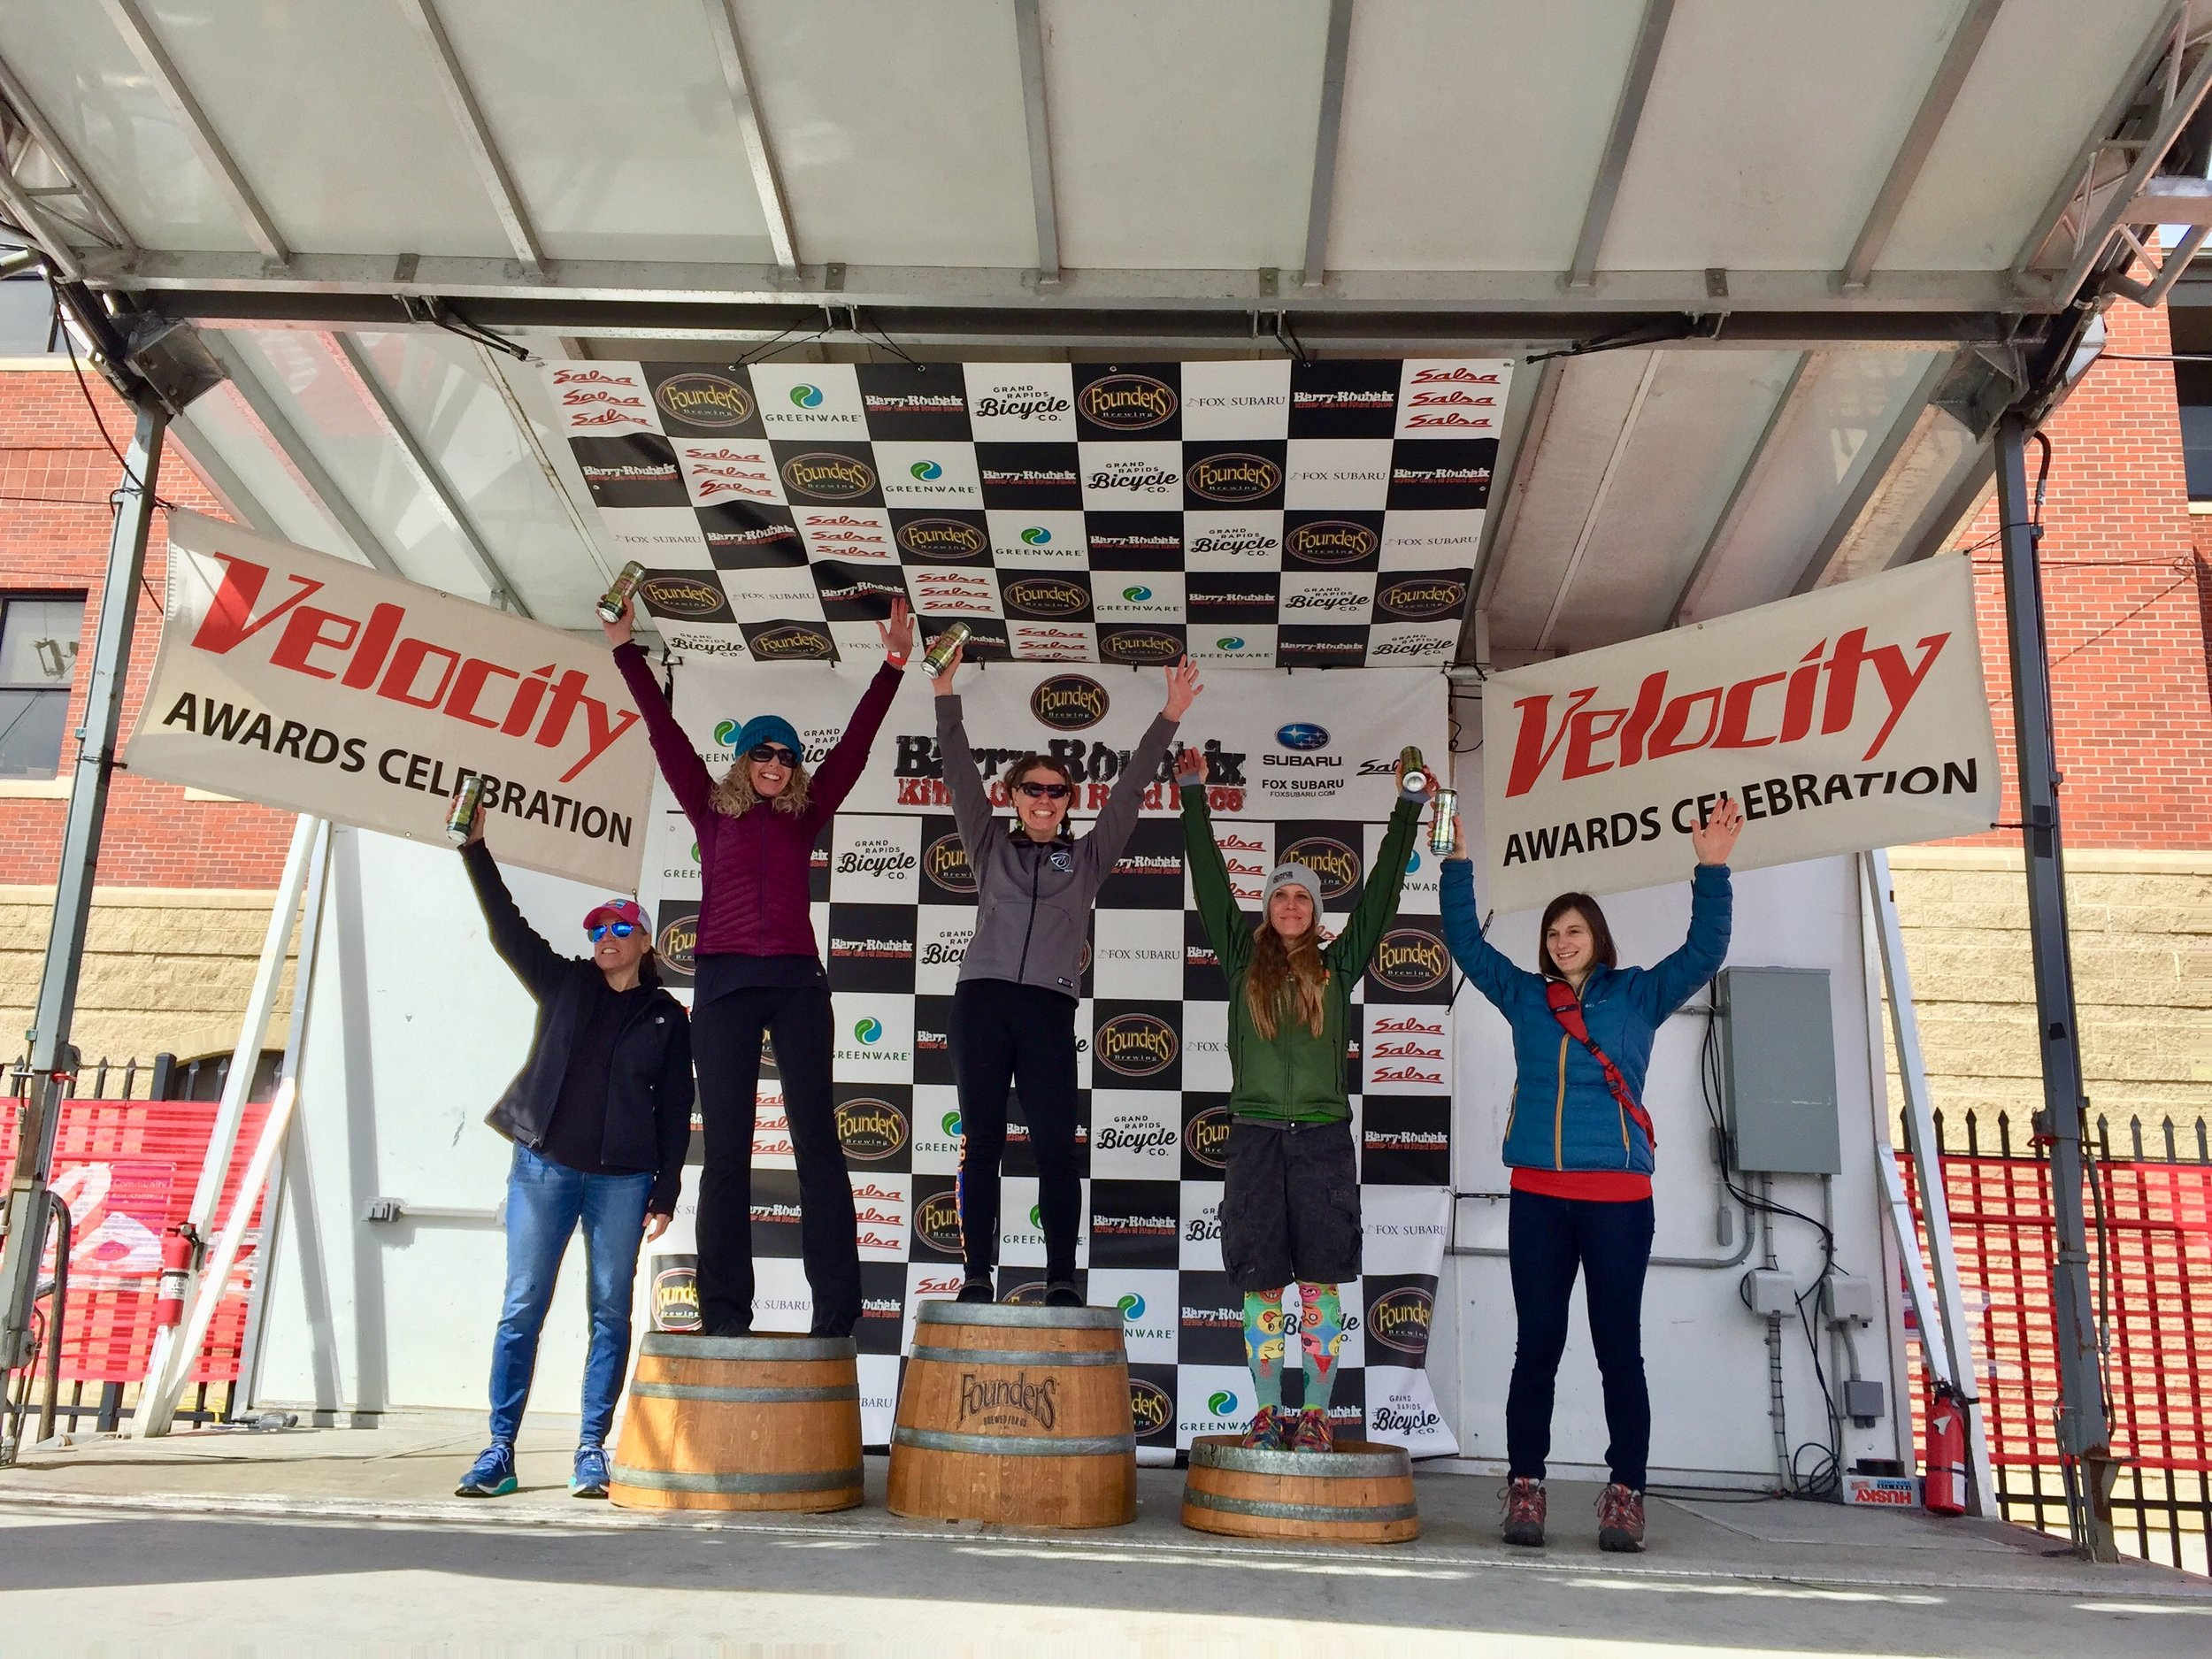 Barry-Roubaix 2019 Women's Fat Bike Podium